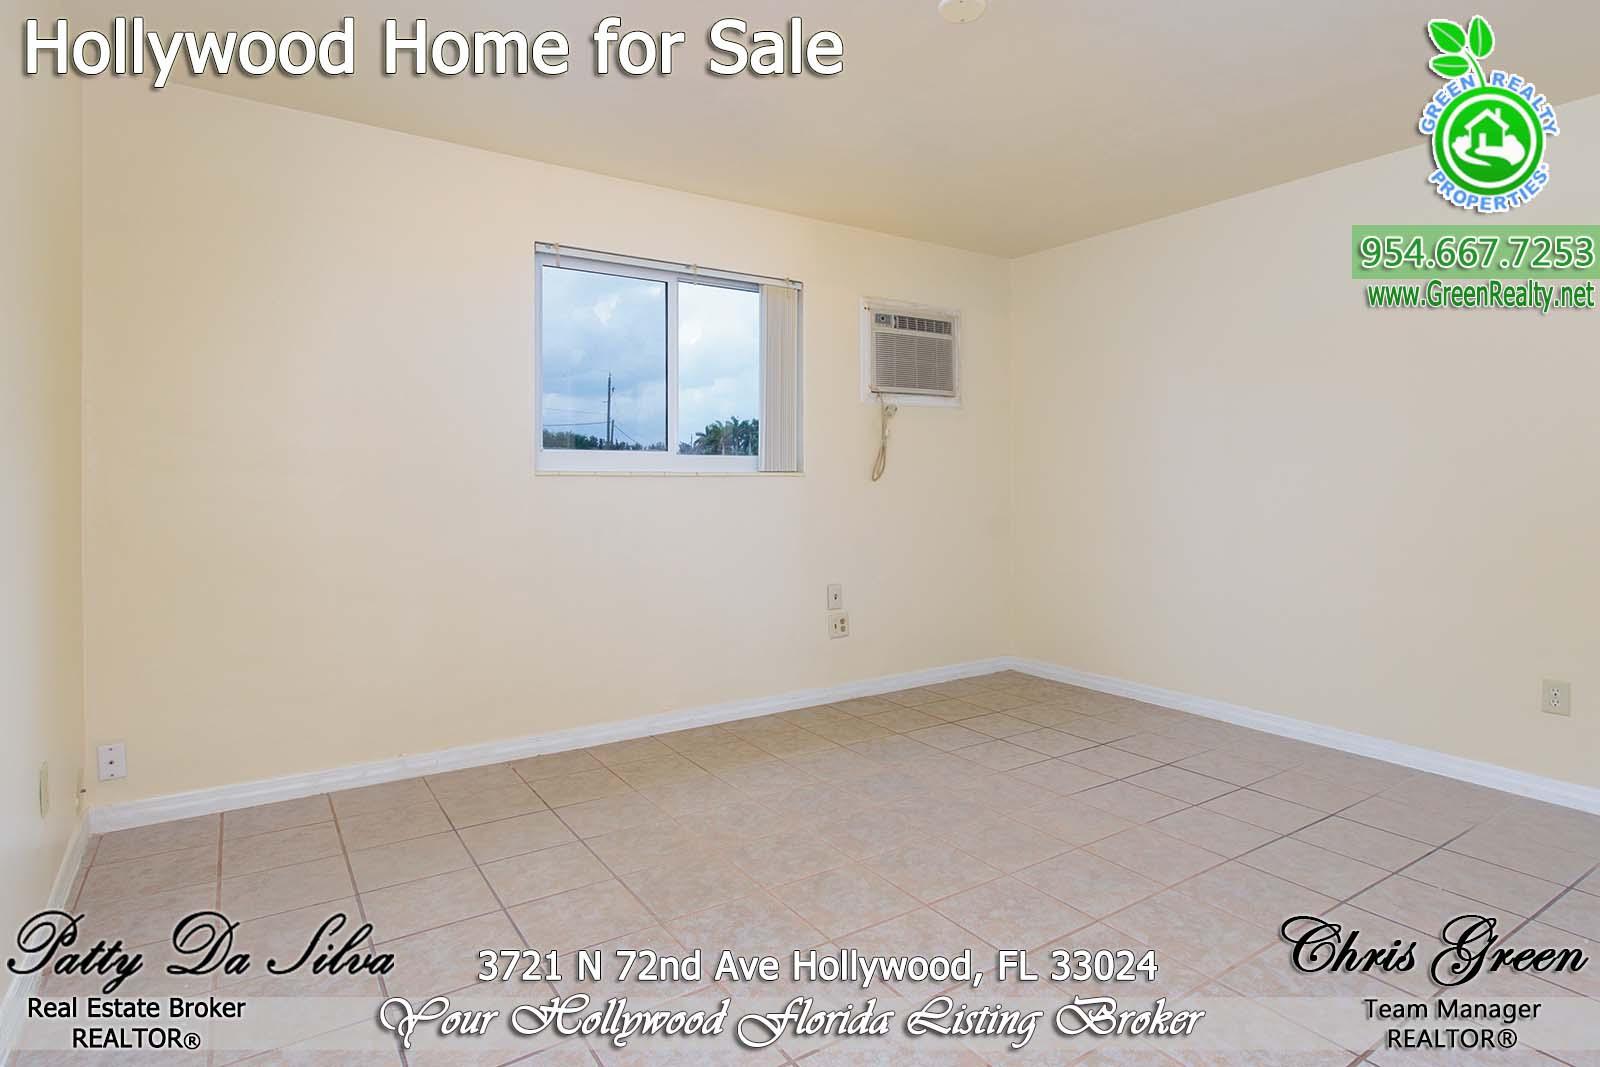 10 Hollywood Florida Real Estate Listing Patty Da Silva Green Realty properties (12)